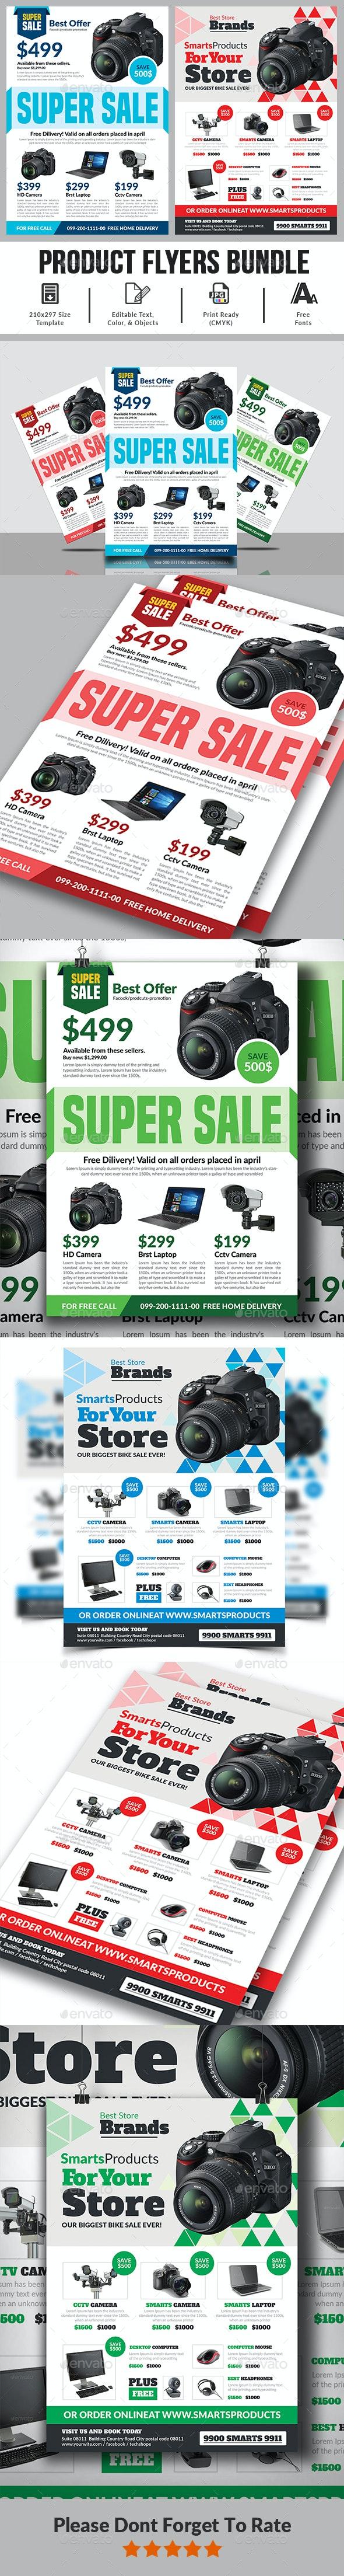 Product Flyer Bundle Templates - Commerce Flyers